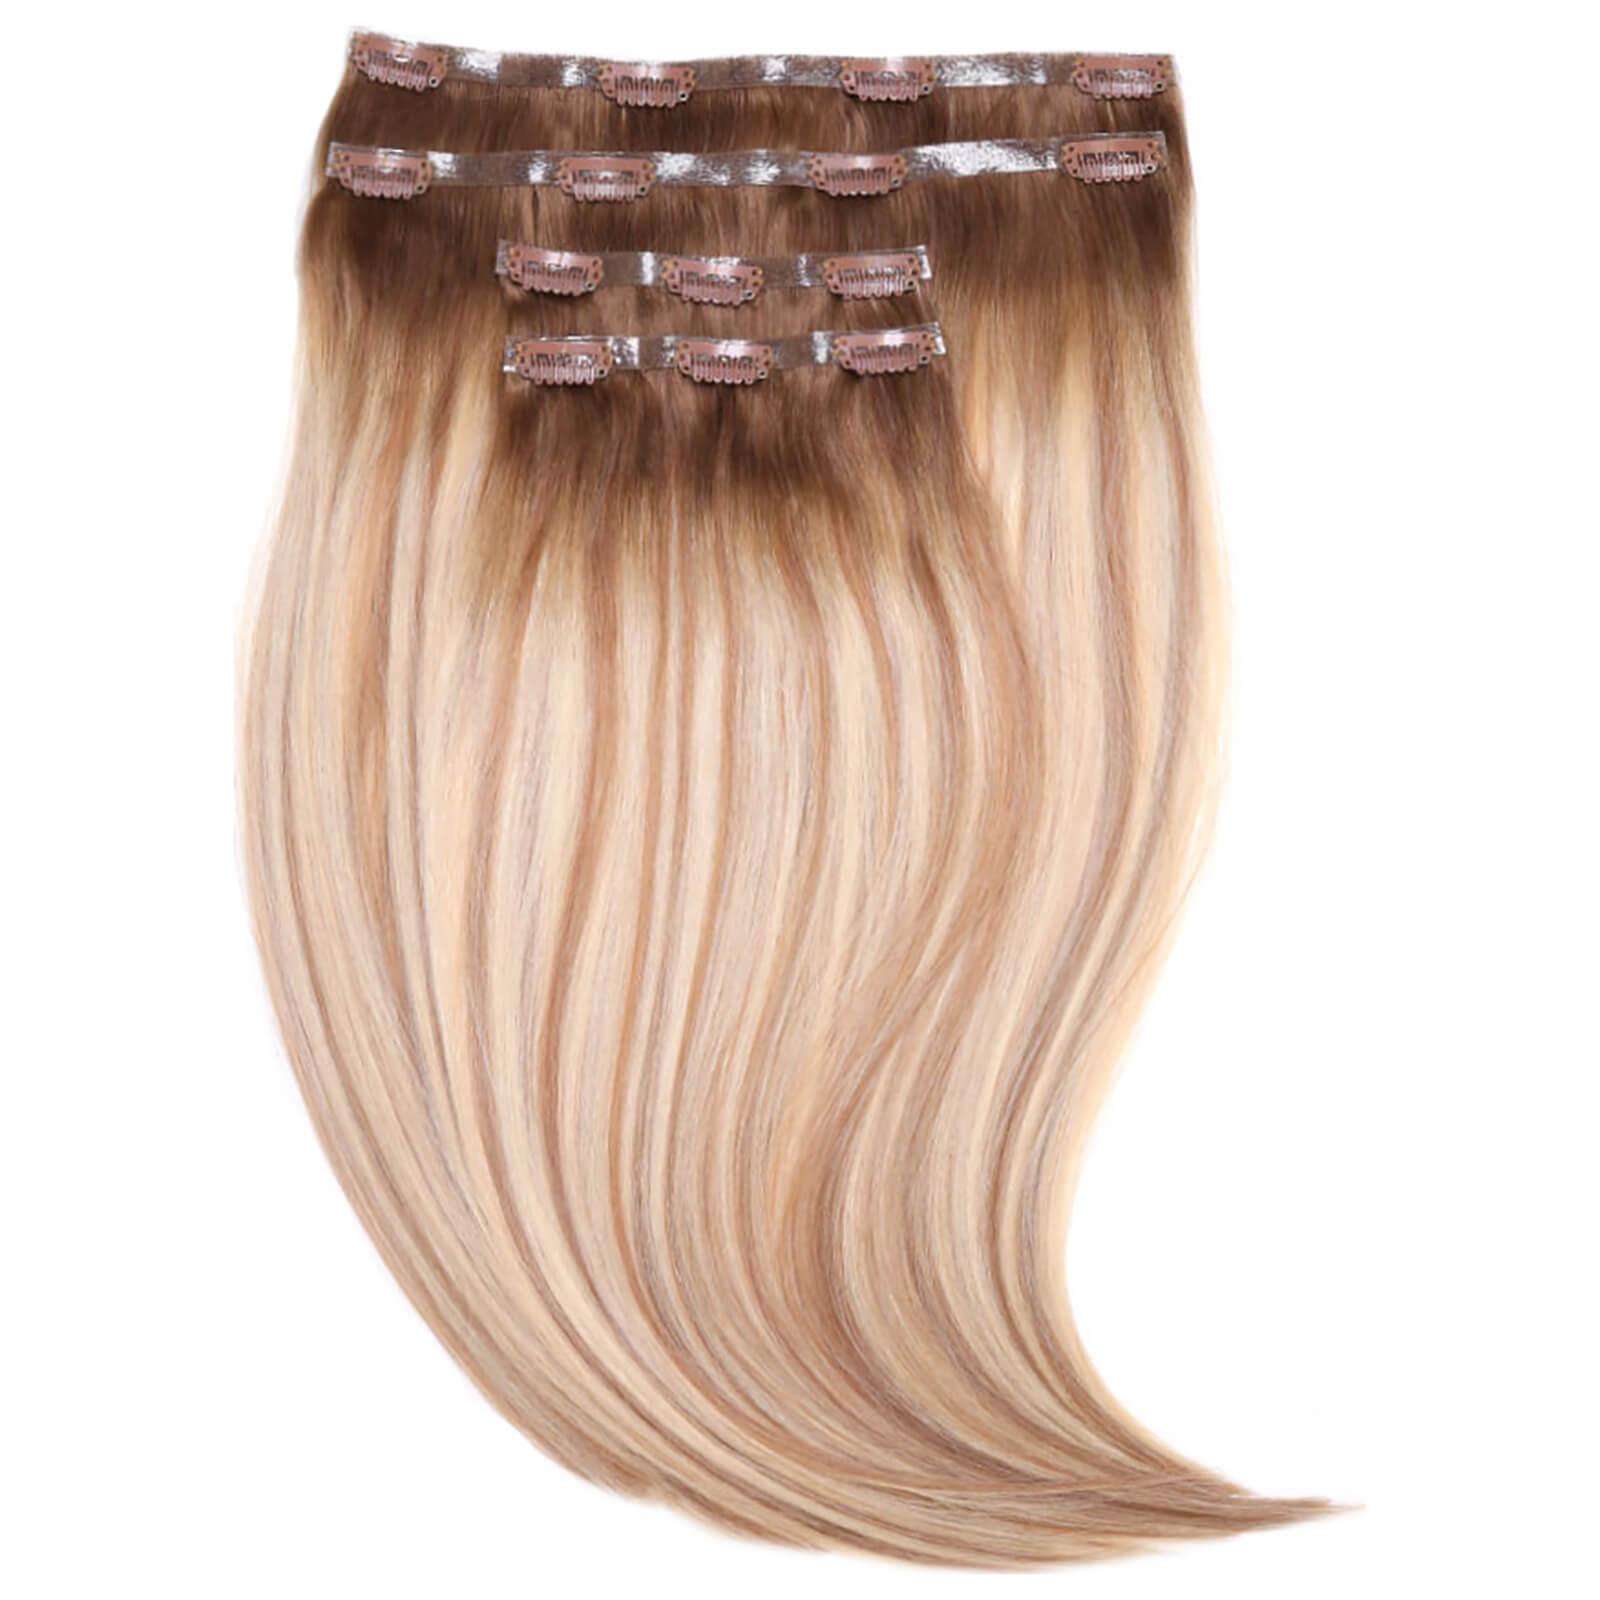 Beauty Works Jen Atkin Invisi Clip In Hair Extensions 18 Santa Maybelline Volumamp039 Express The Magnum Mascara Black 6 Pcs Monica